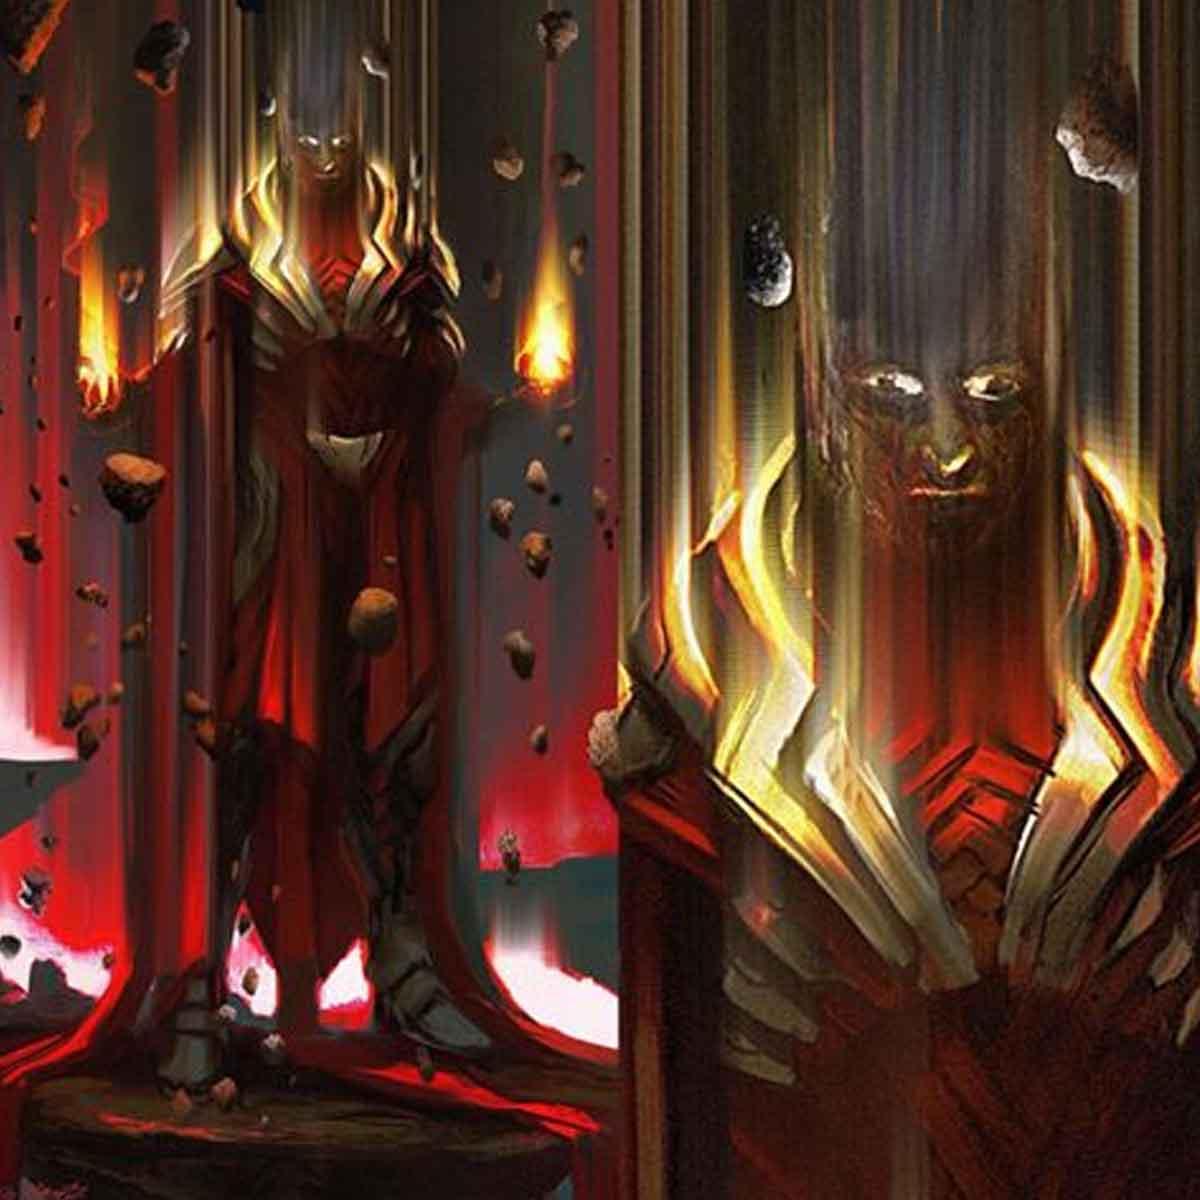 Diseño alternativo al gran villano de Doctor Strange